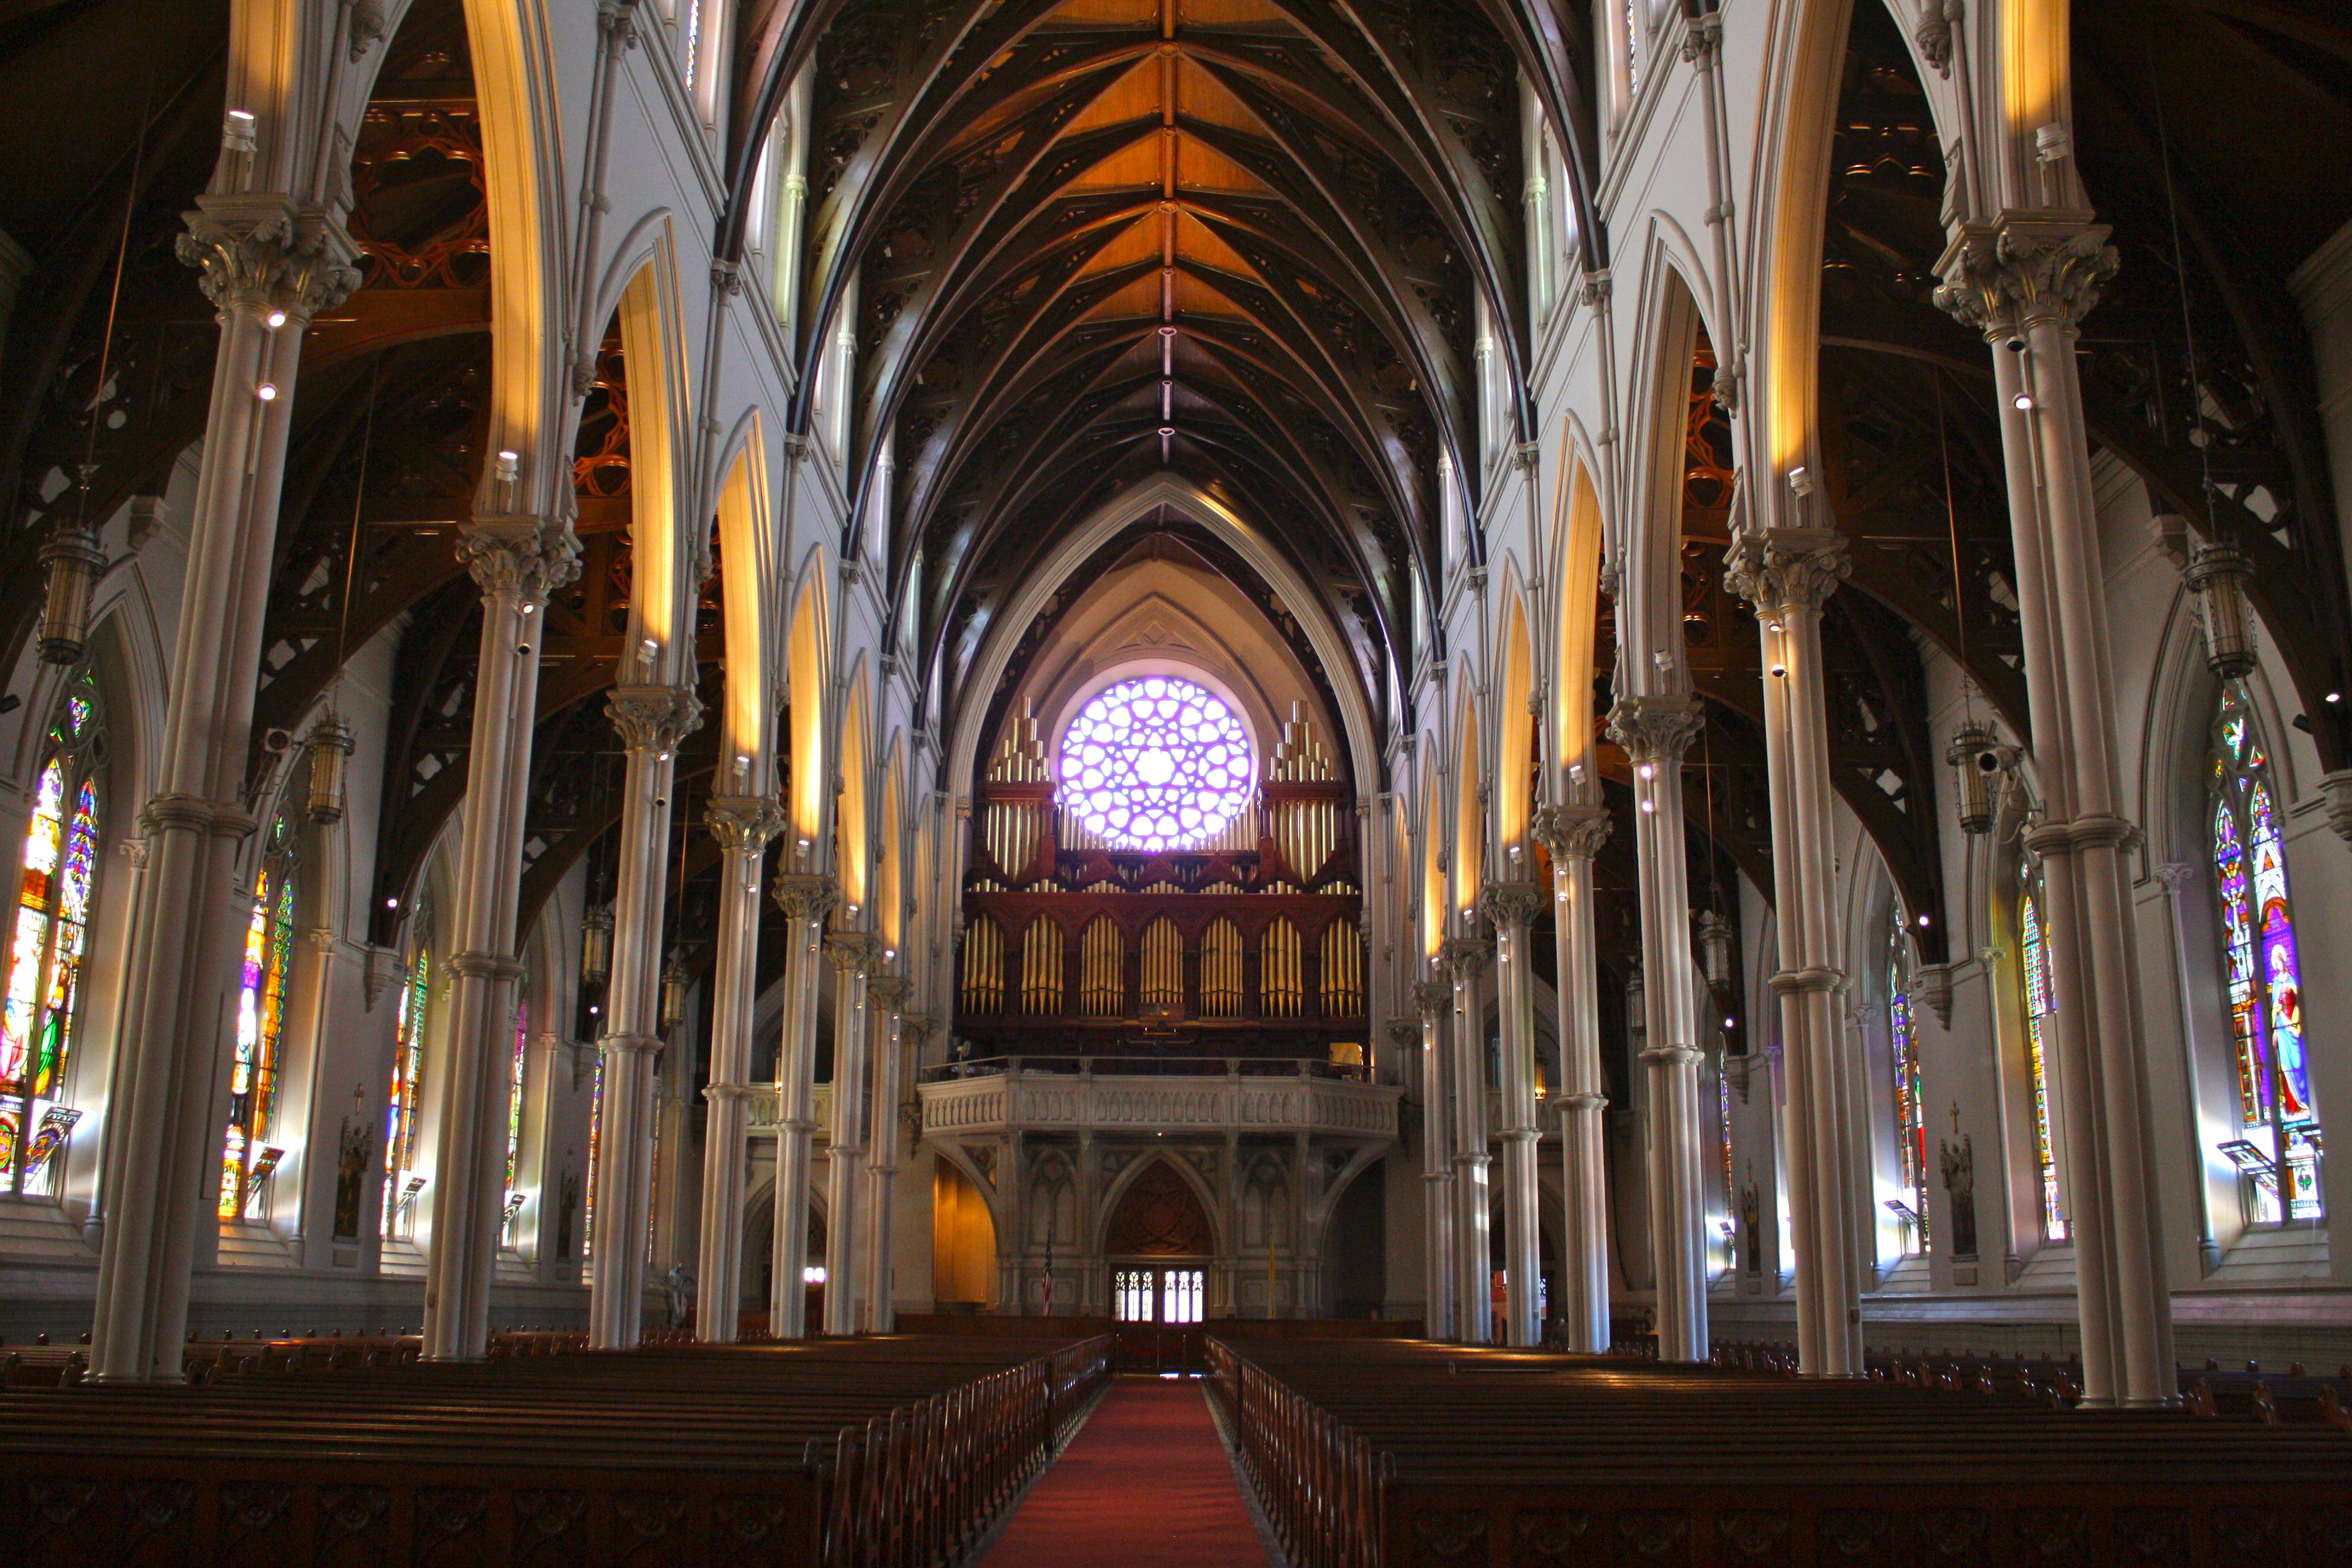 east boston catholic single men Northeast ne retreats and retreat centers for spiritual and healing retreats in  mens (no specific type), men's issues, mens  catholic interfaith.